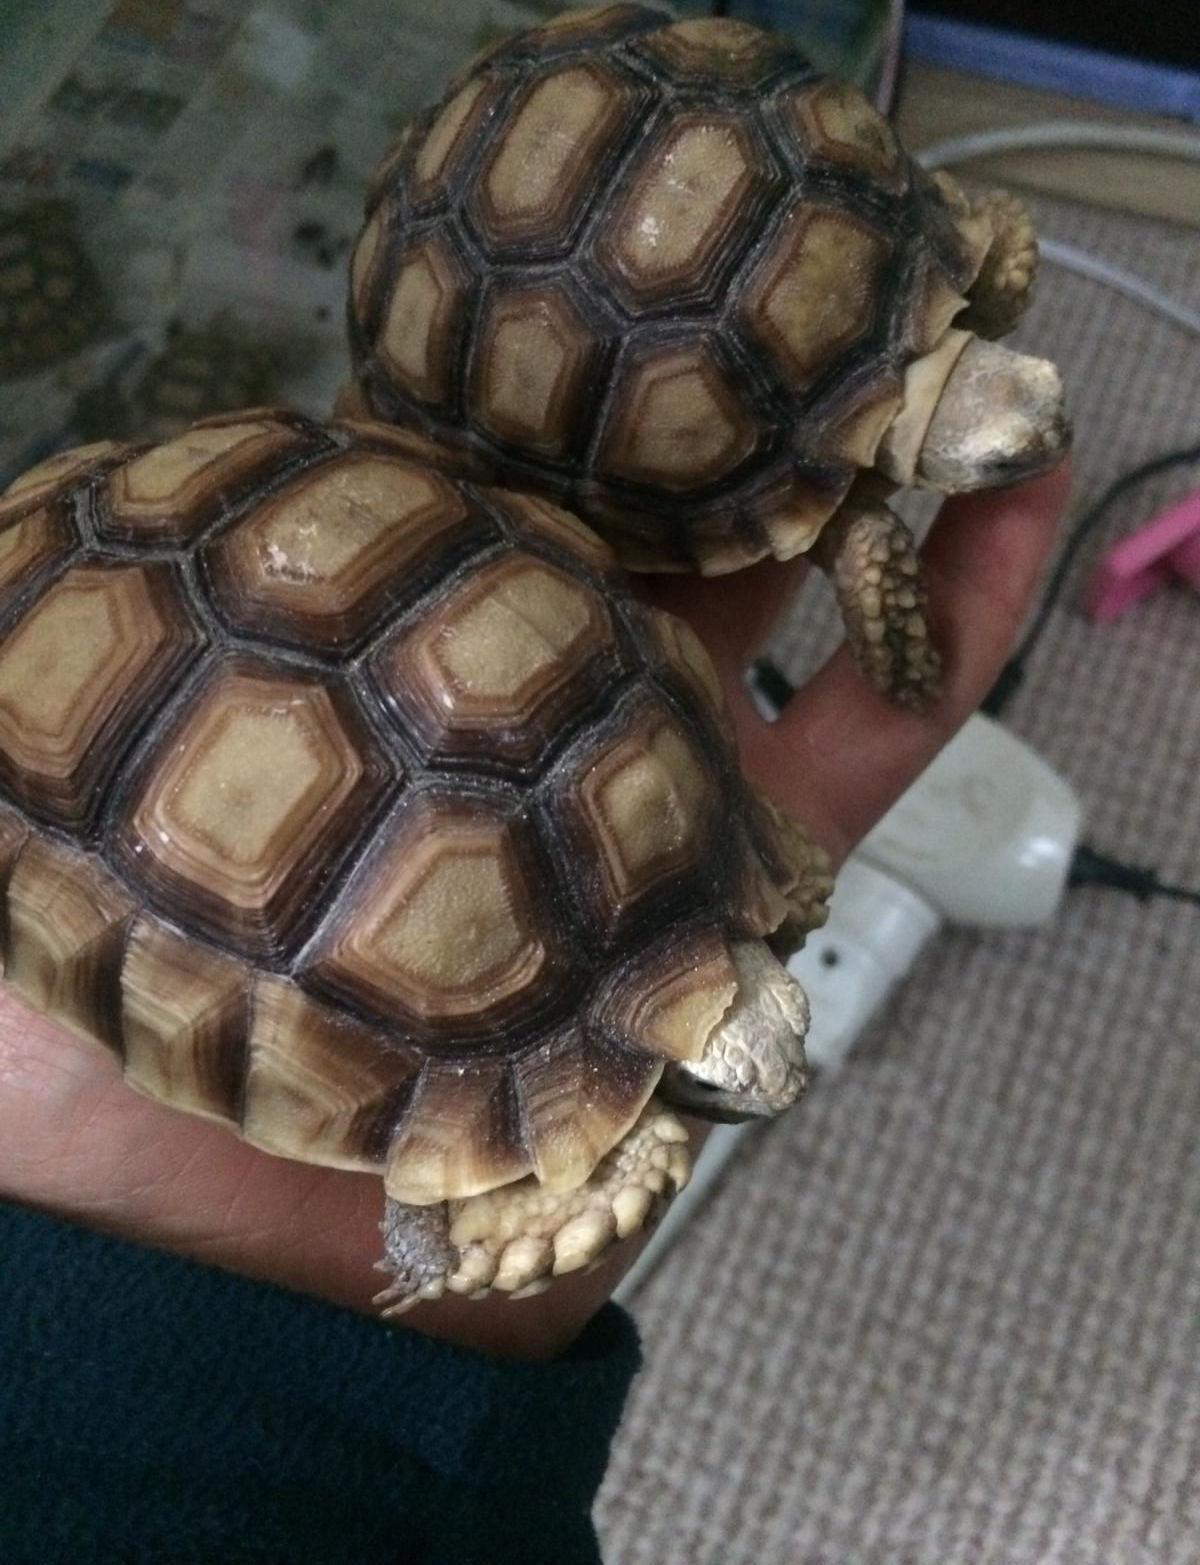 Mahmuzlu kaplumbağa (sulcata tortoise)